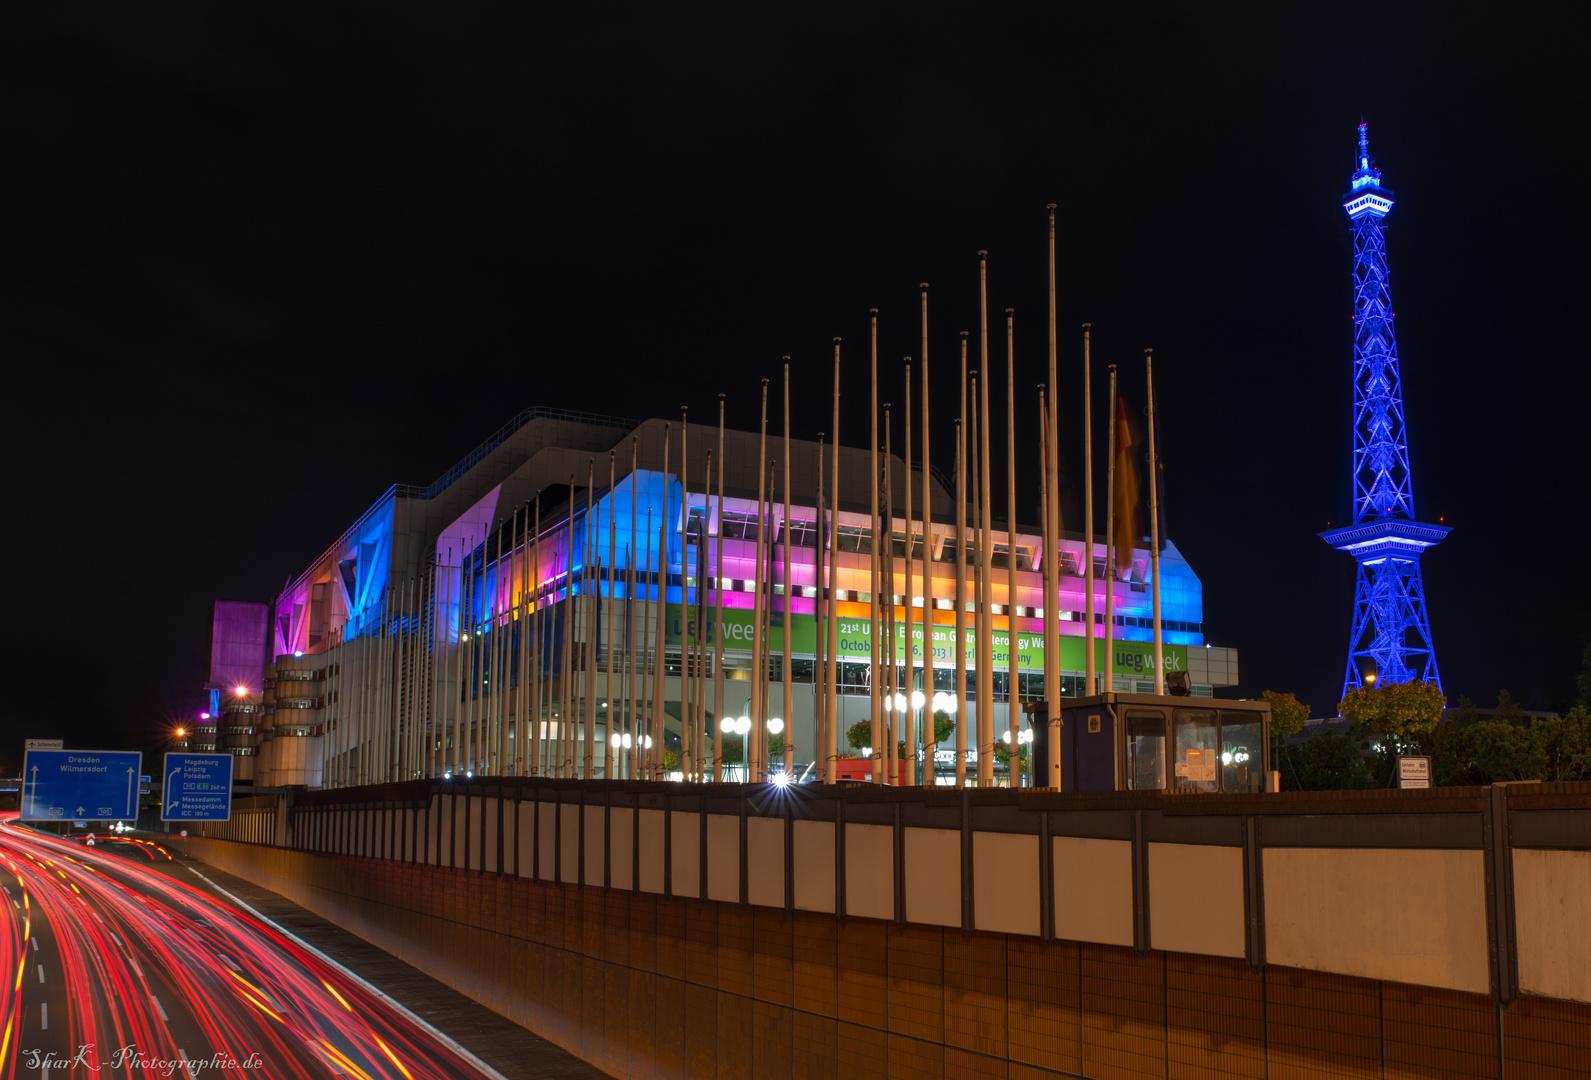 Festival of Lights 2013 - ICC